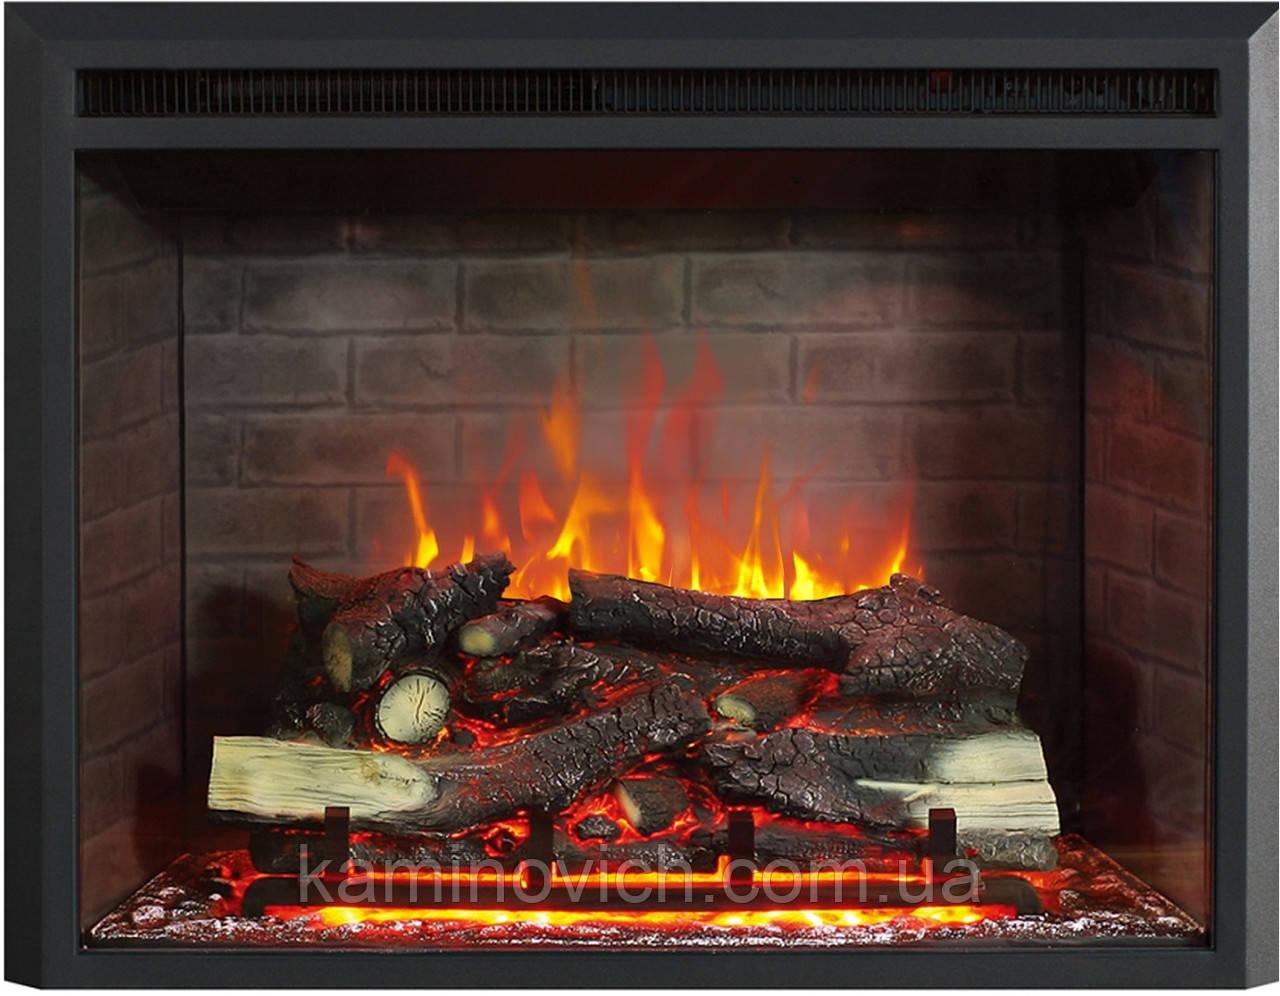 Електричний камін Bonfire Venus 30G